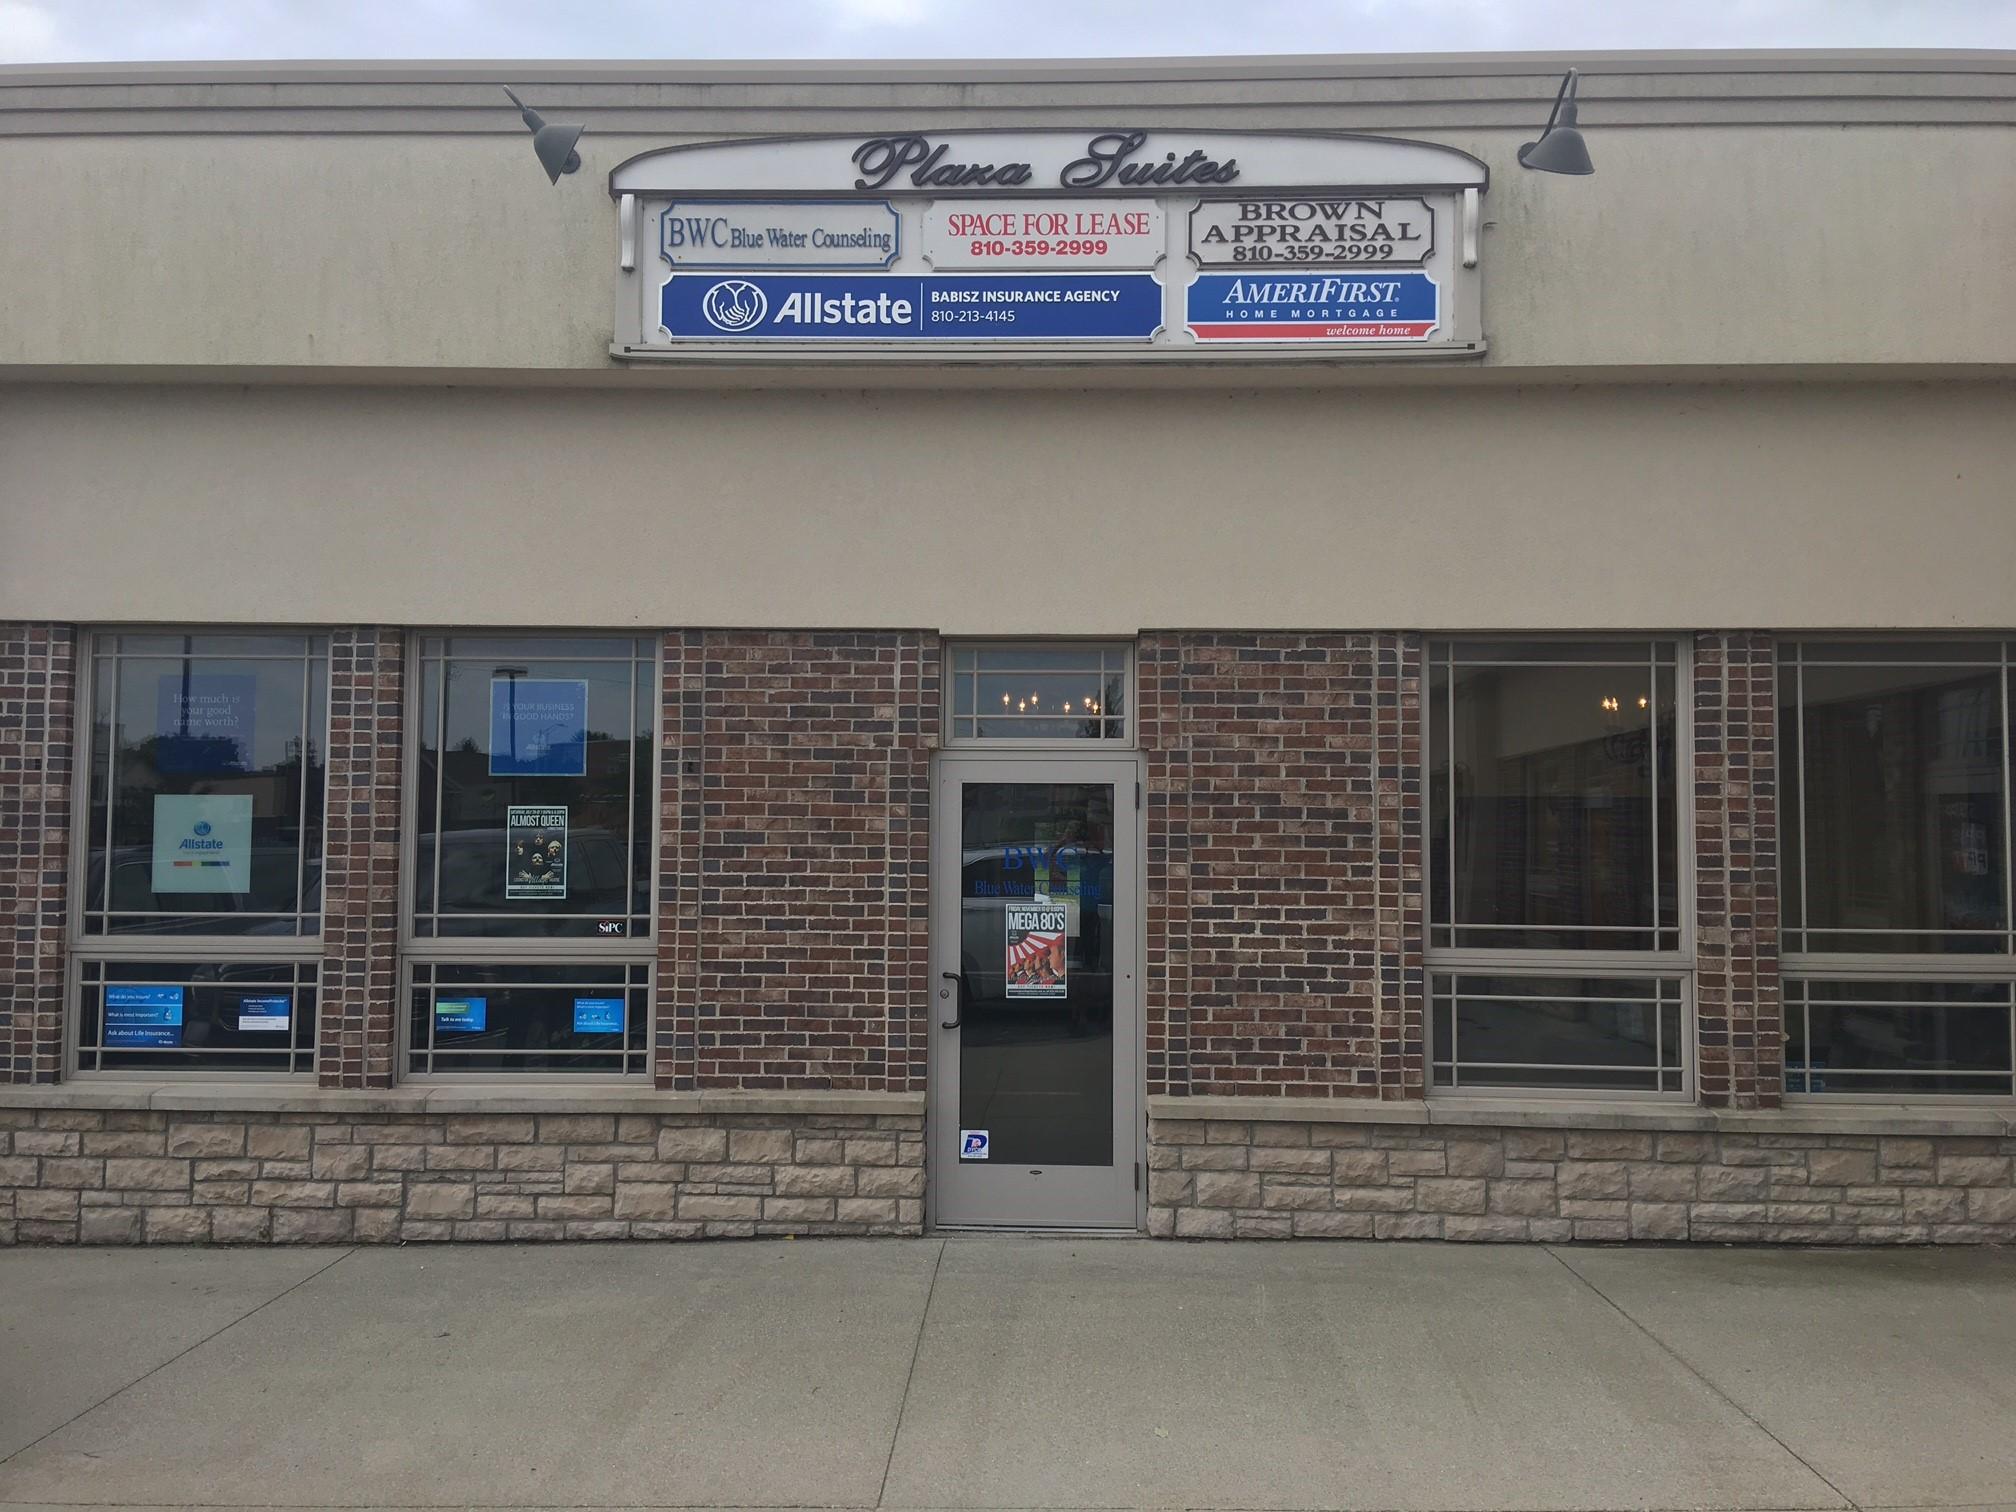 Jeff Babisz: Allstate Insurance image 1